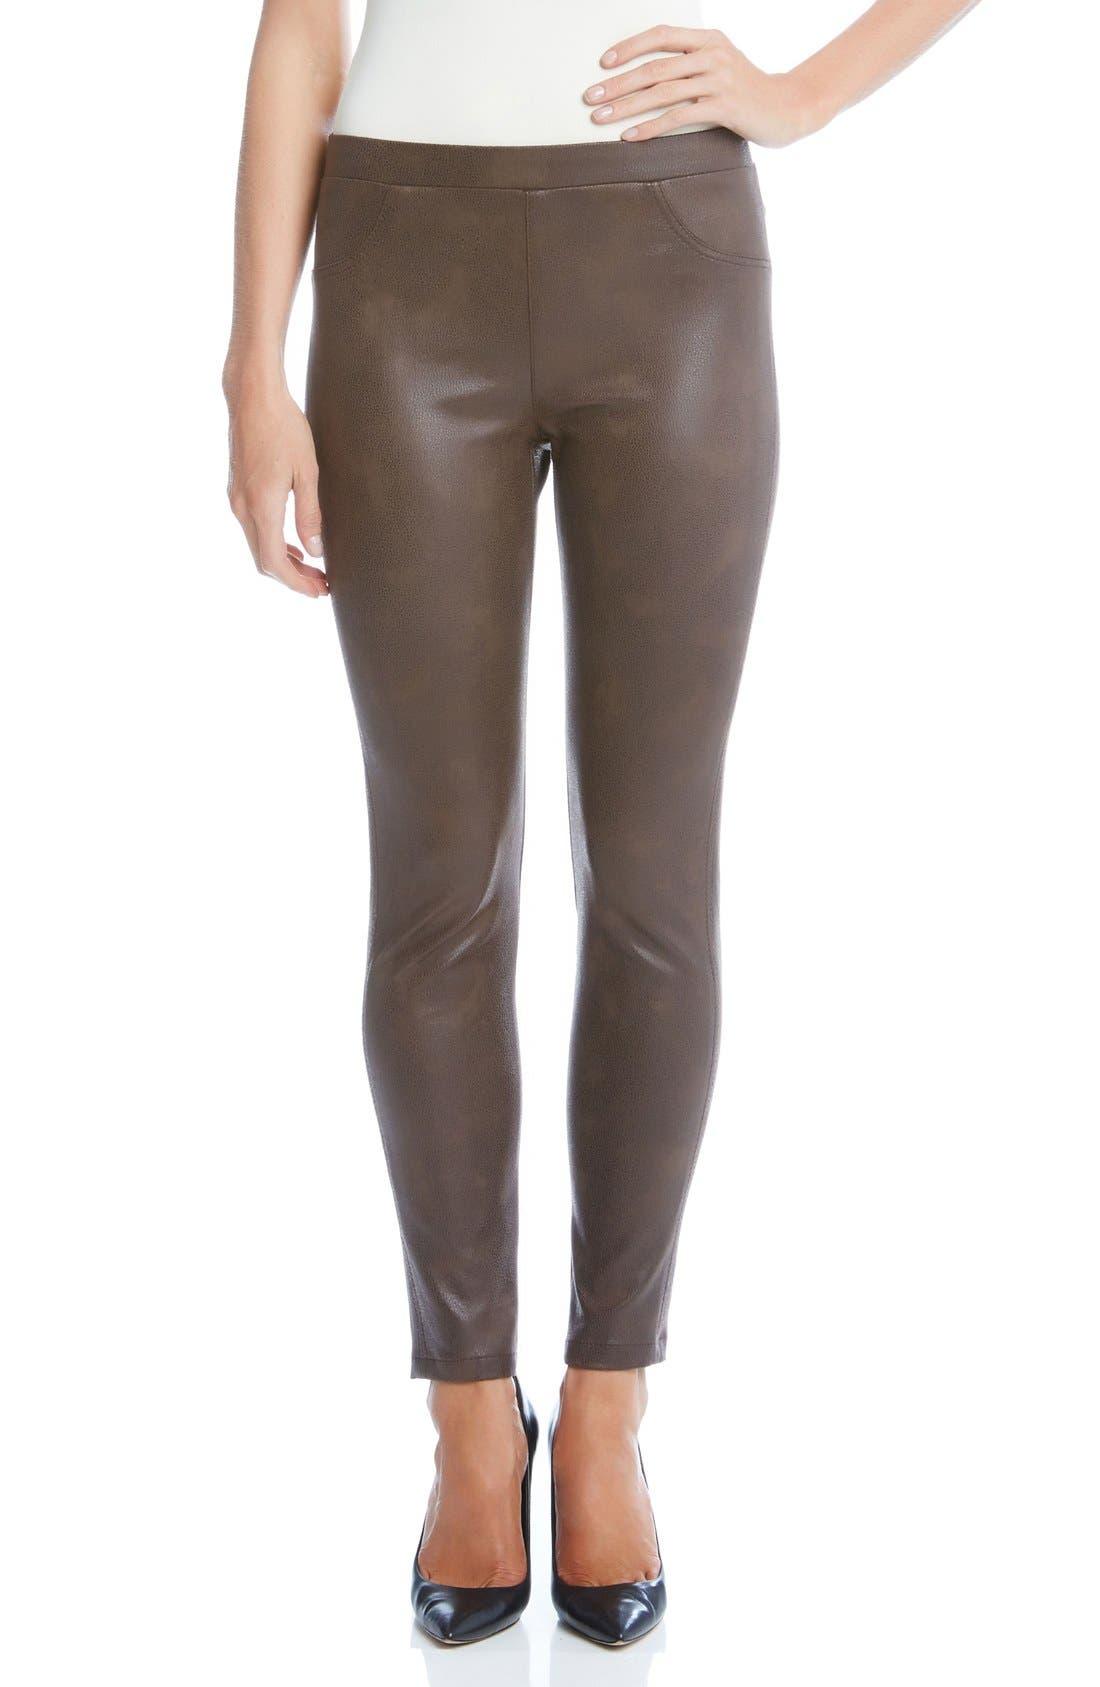 Alternate Image 1 Selected - Karen Karen Stretch Faux Leather Skinny Pants